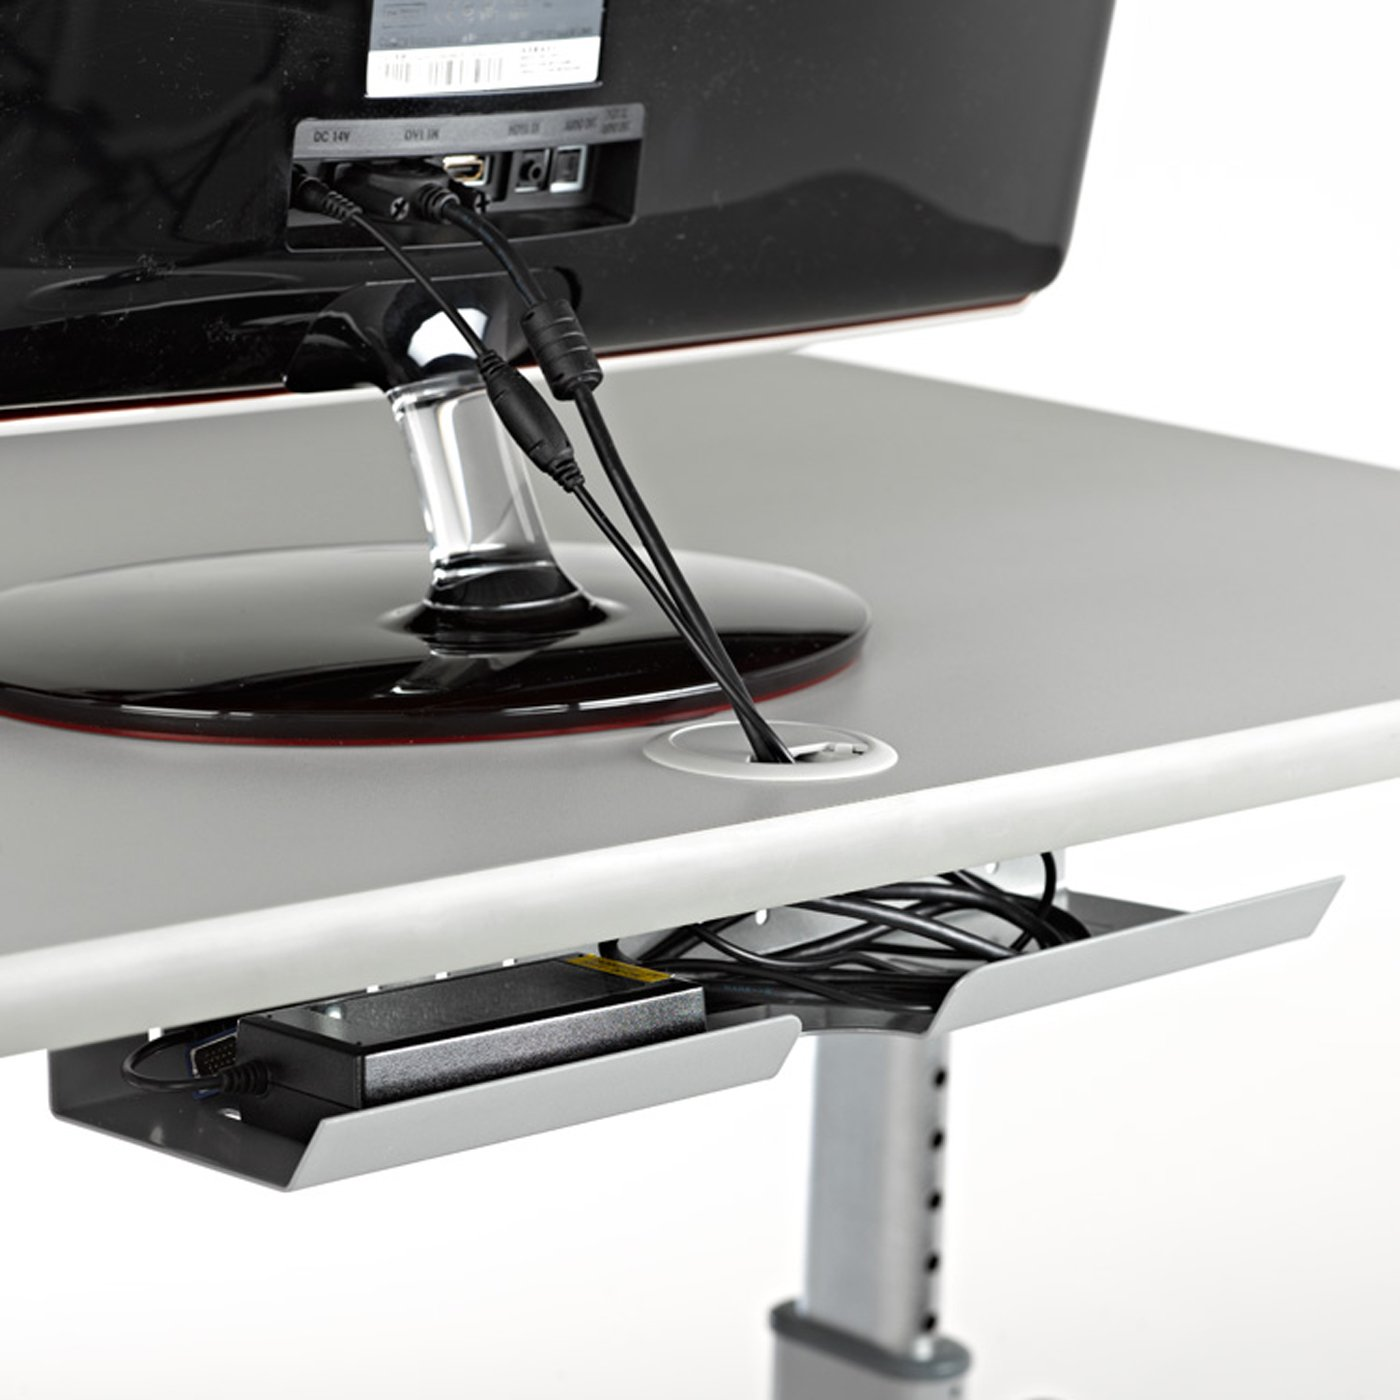 Amazon.com : LifeSpan TR1200-DT5T Treadmill Desktop with Tandem Desk ...